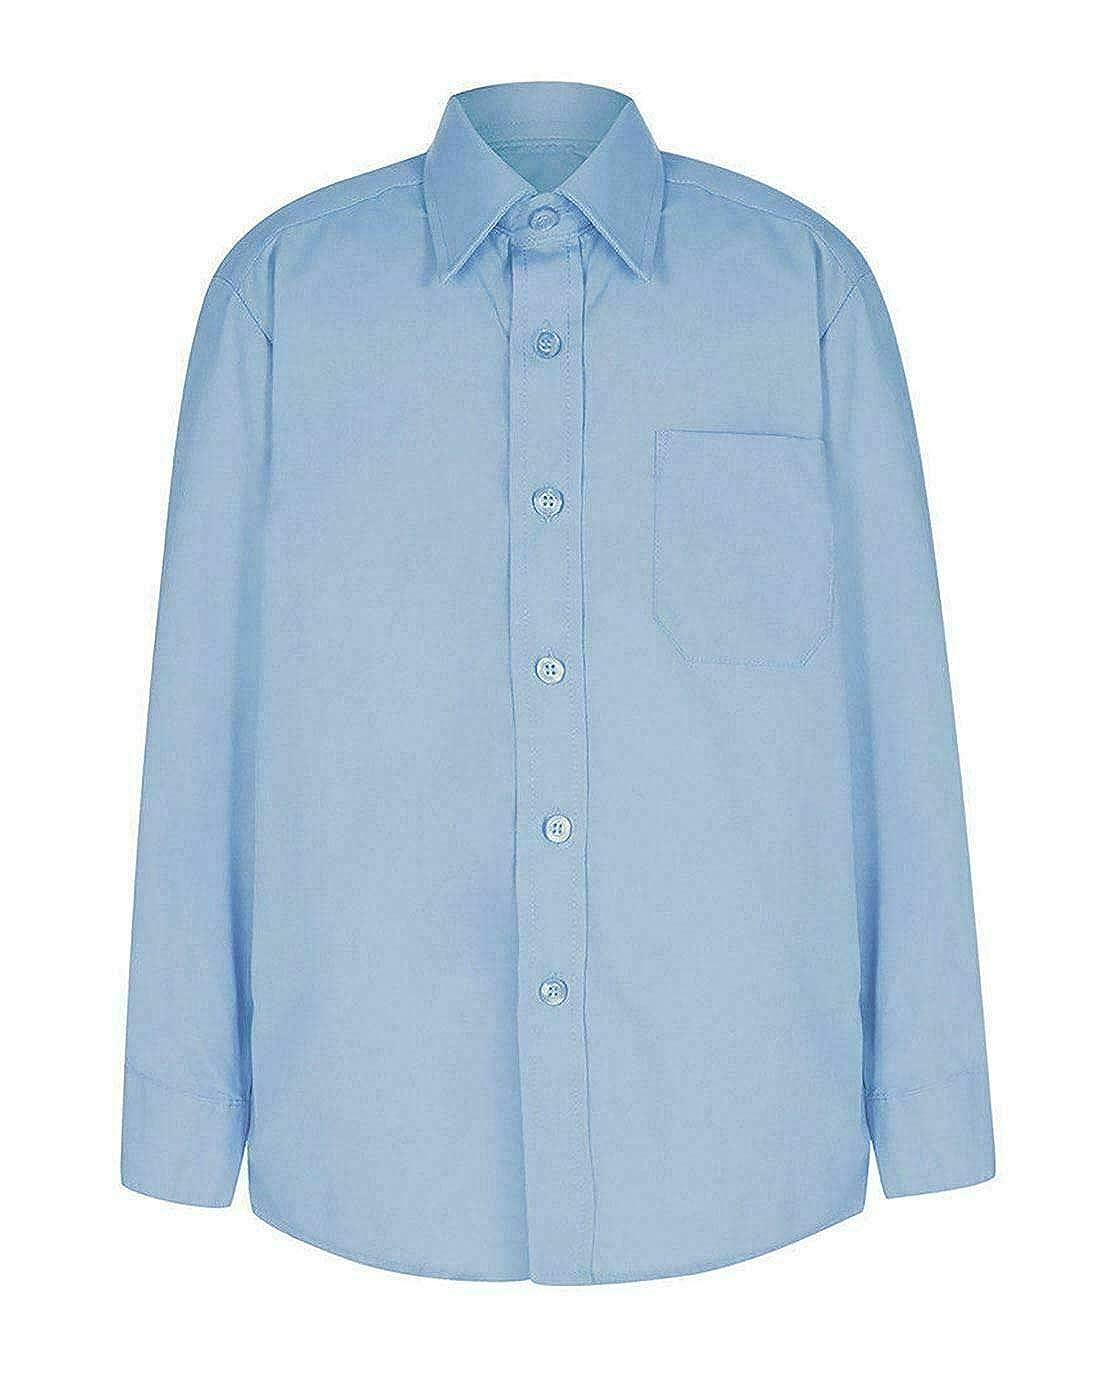 My Choice Stuff Kids School Uniform Button Down Collared Shirt Formal Top